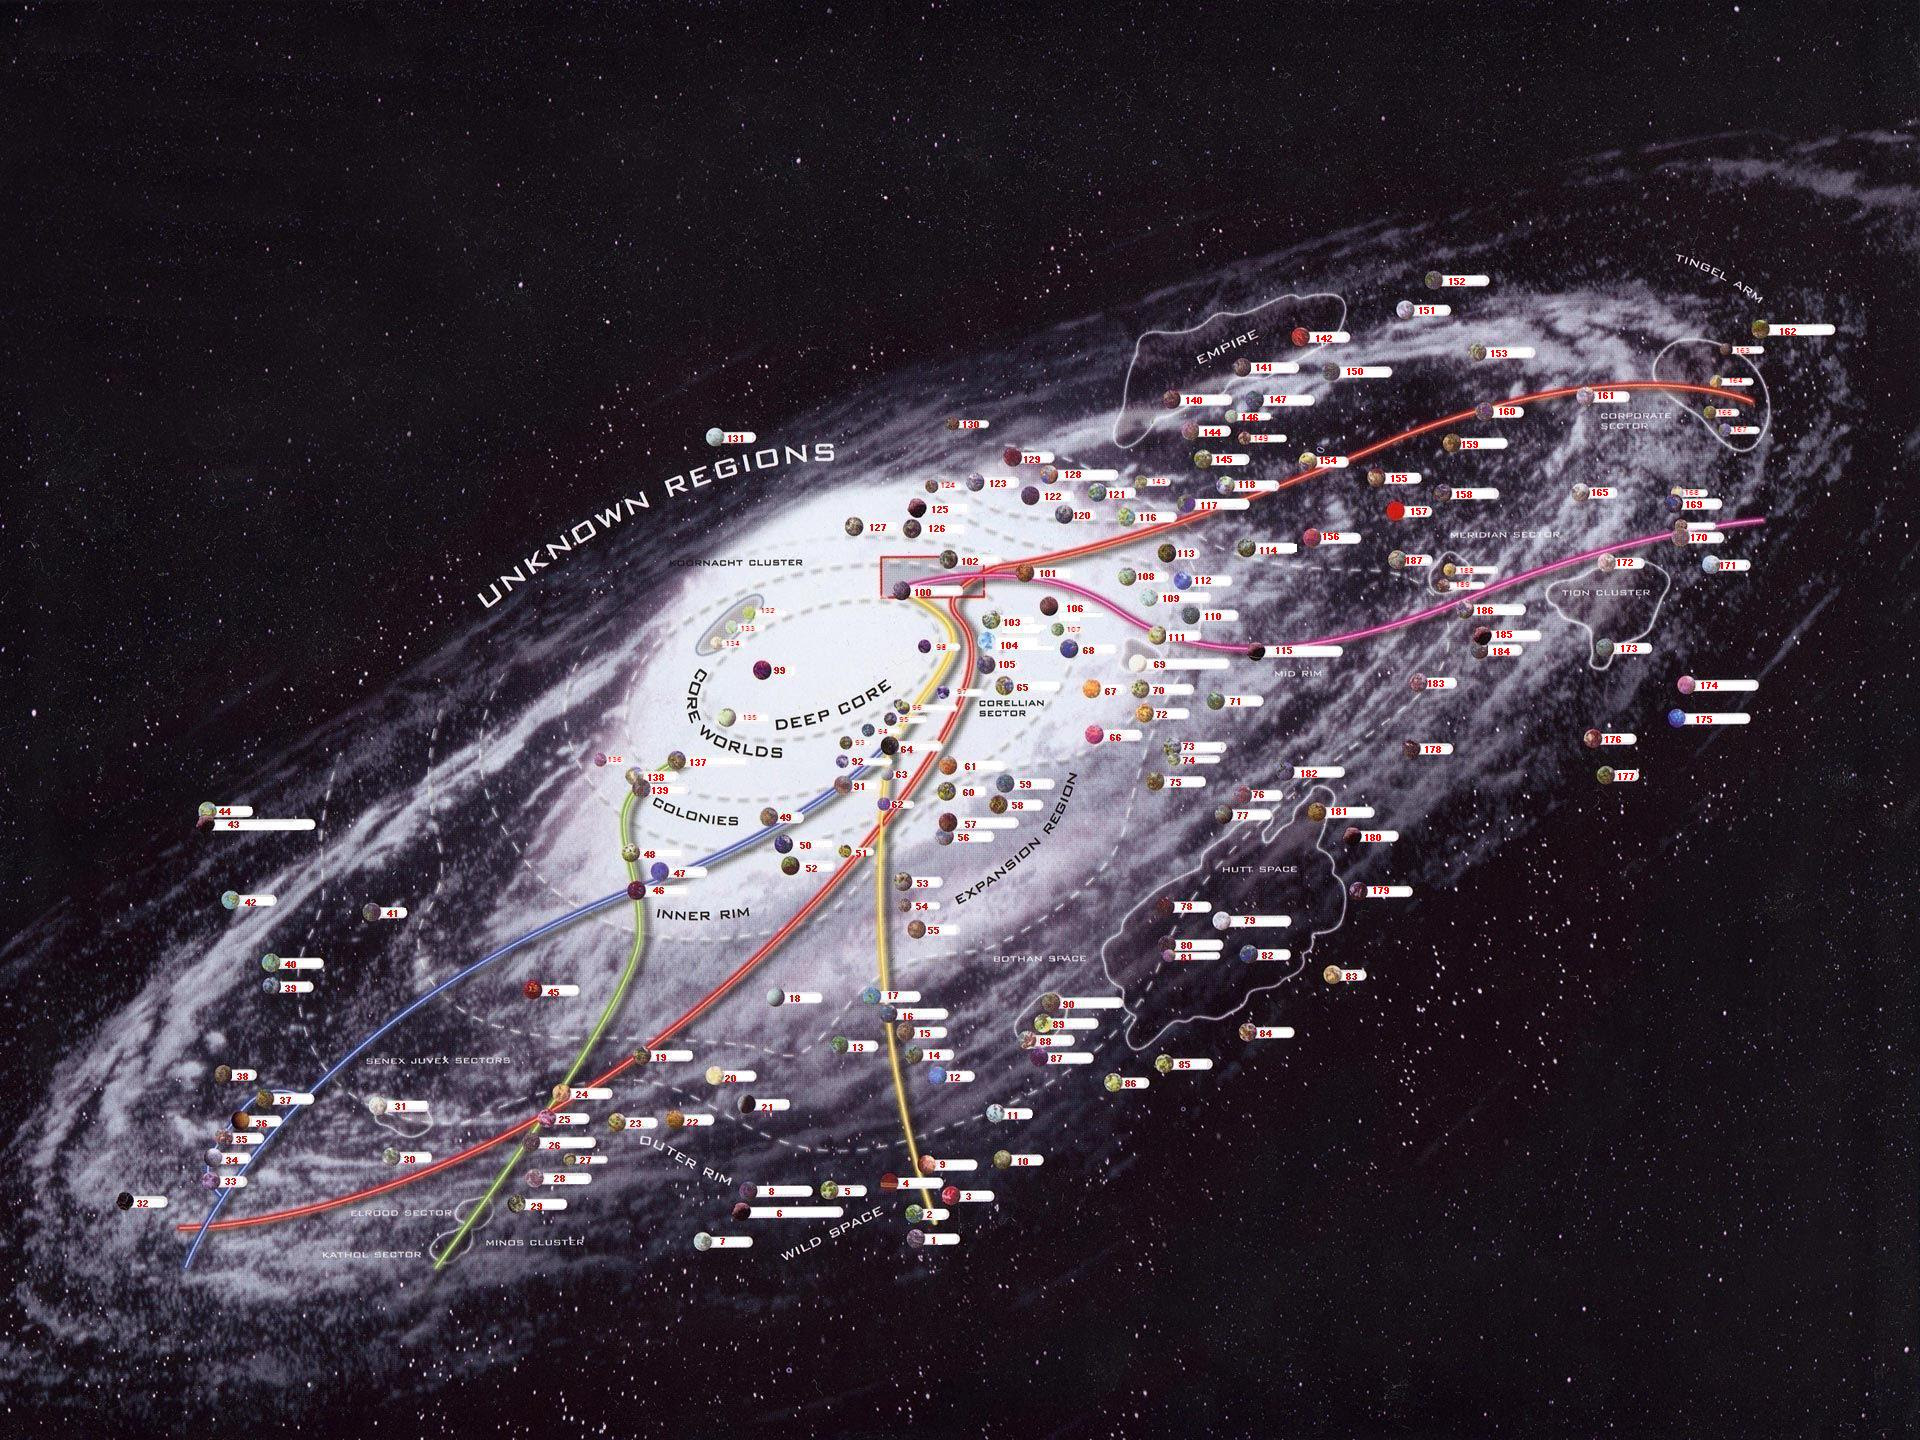 bolygó térkép Bolygó Térkép | Térkép